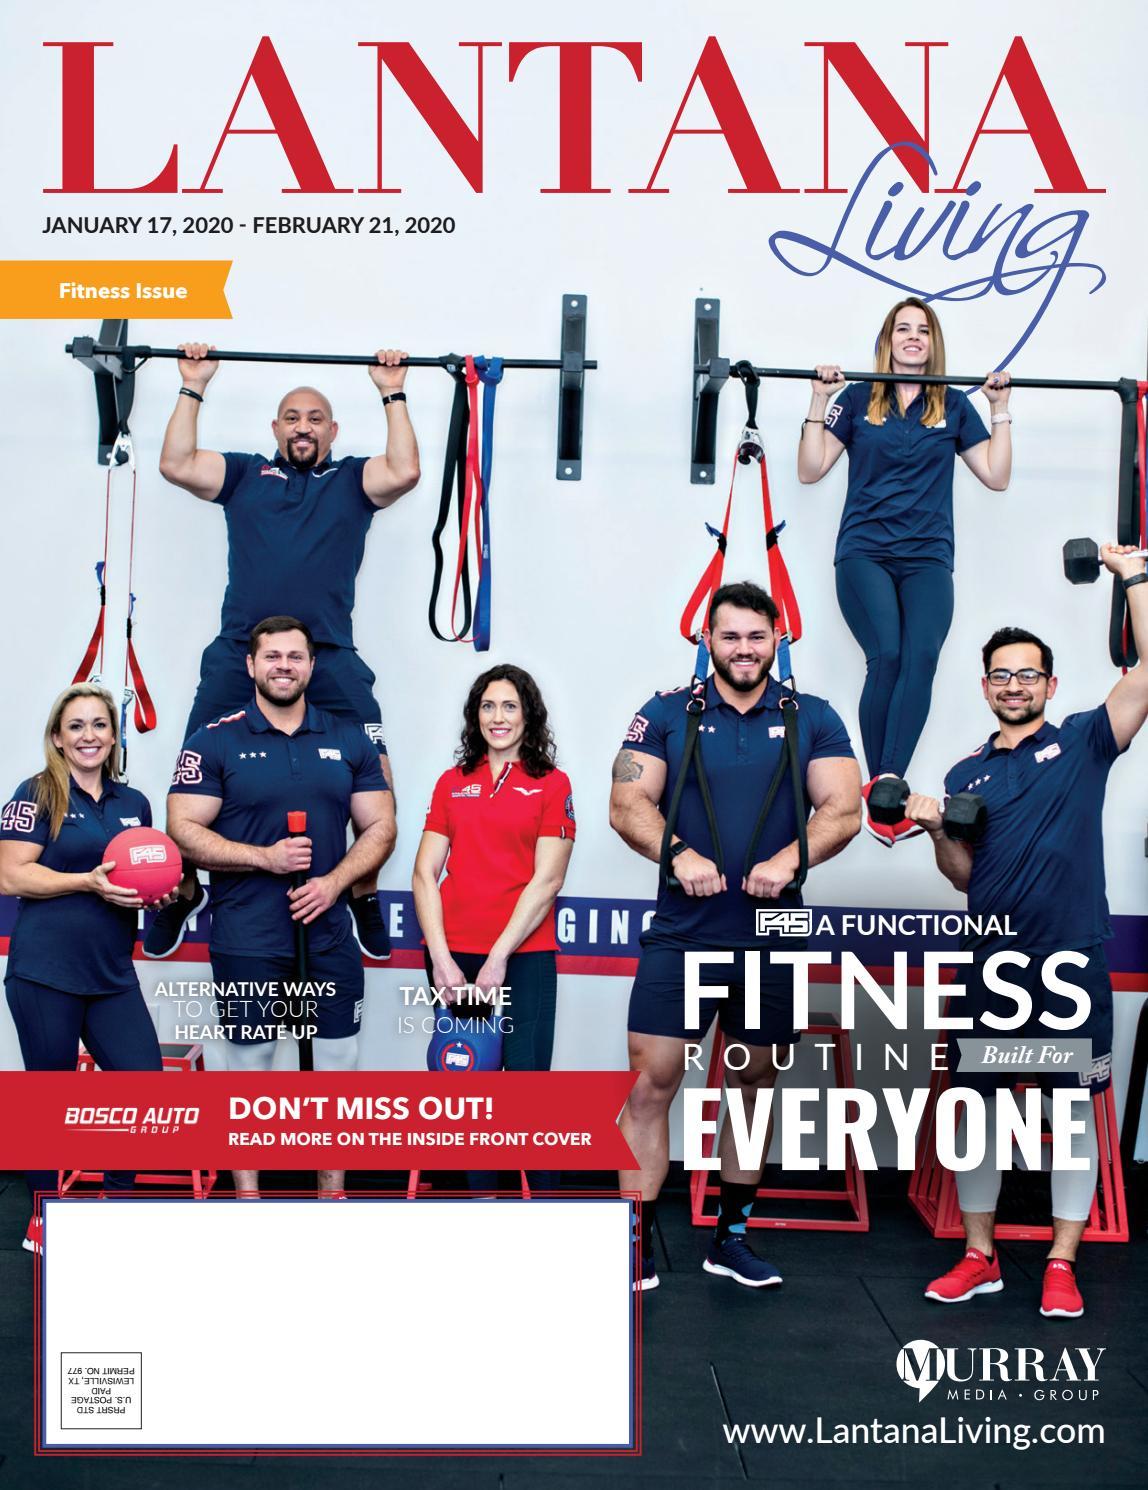 Lantana Texas Halloween 2020 Lantana Living Magazine January 2020 by Murray Media Group   issuu